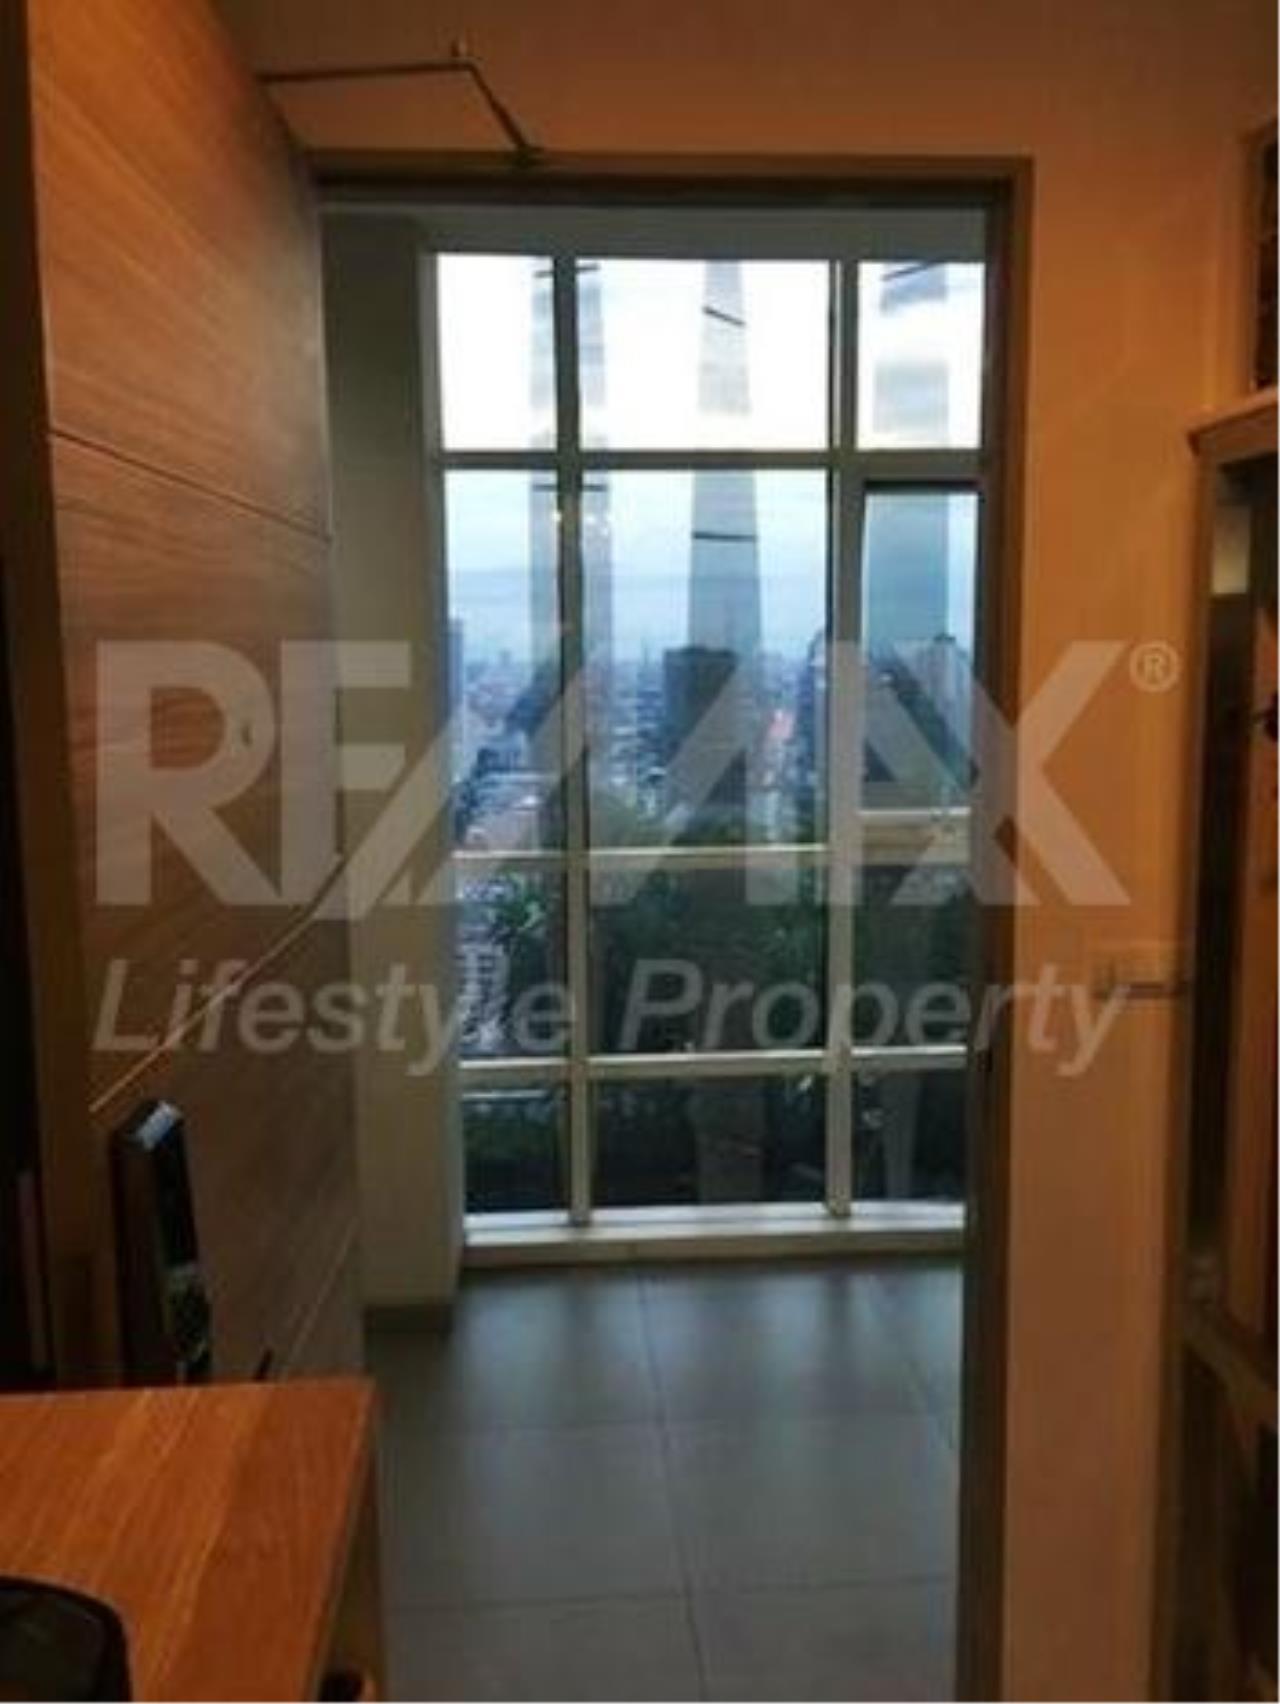 RE/MAX LifeStyle Property Agency's Ideo Verve Ratchaprarop 7